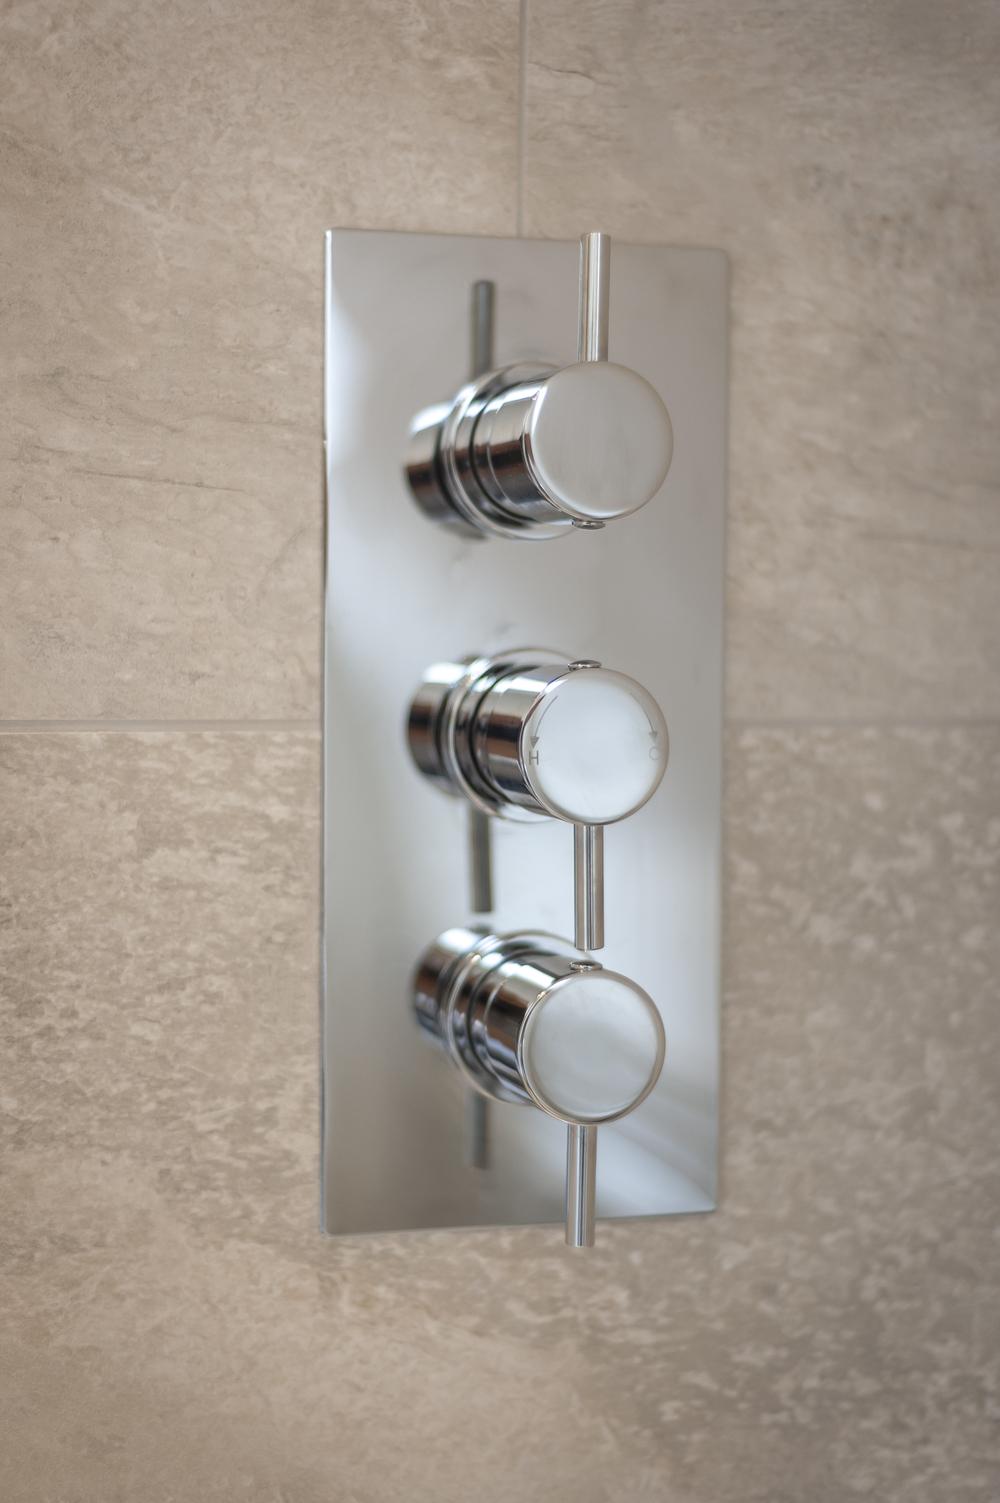 Shower Controls against Limestone Tiles